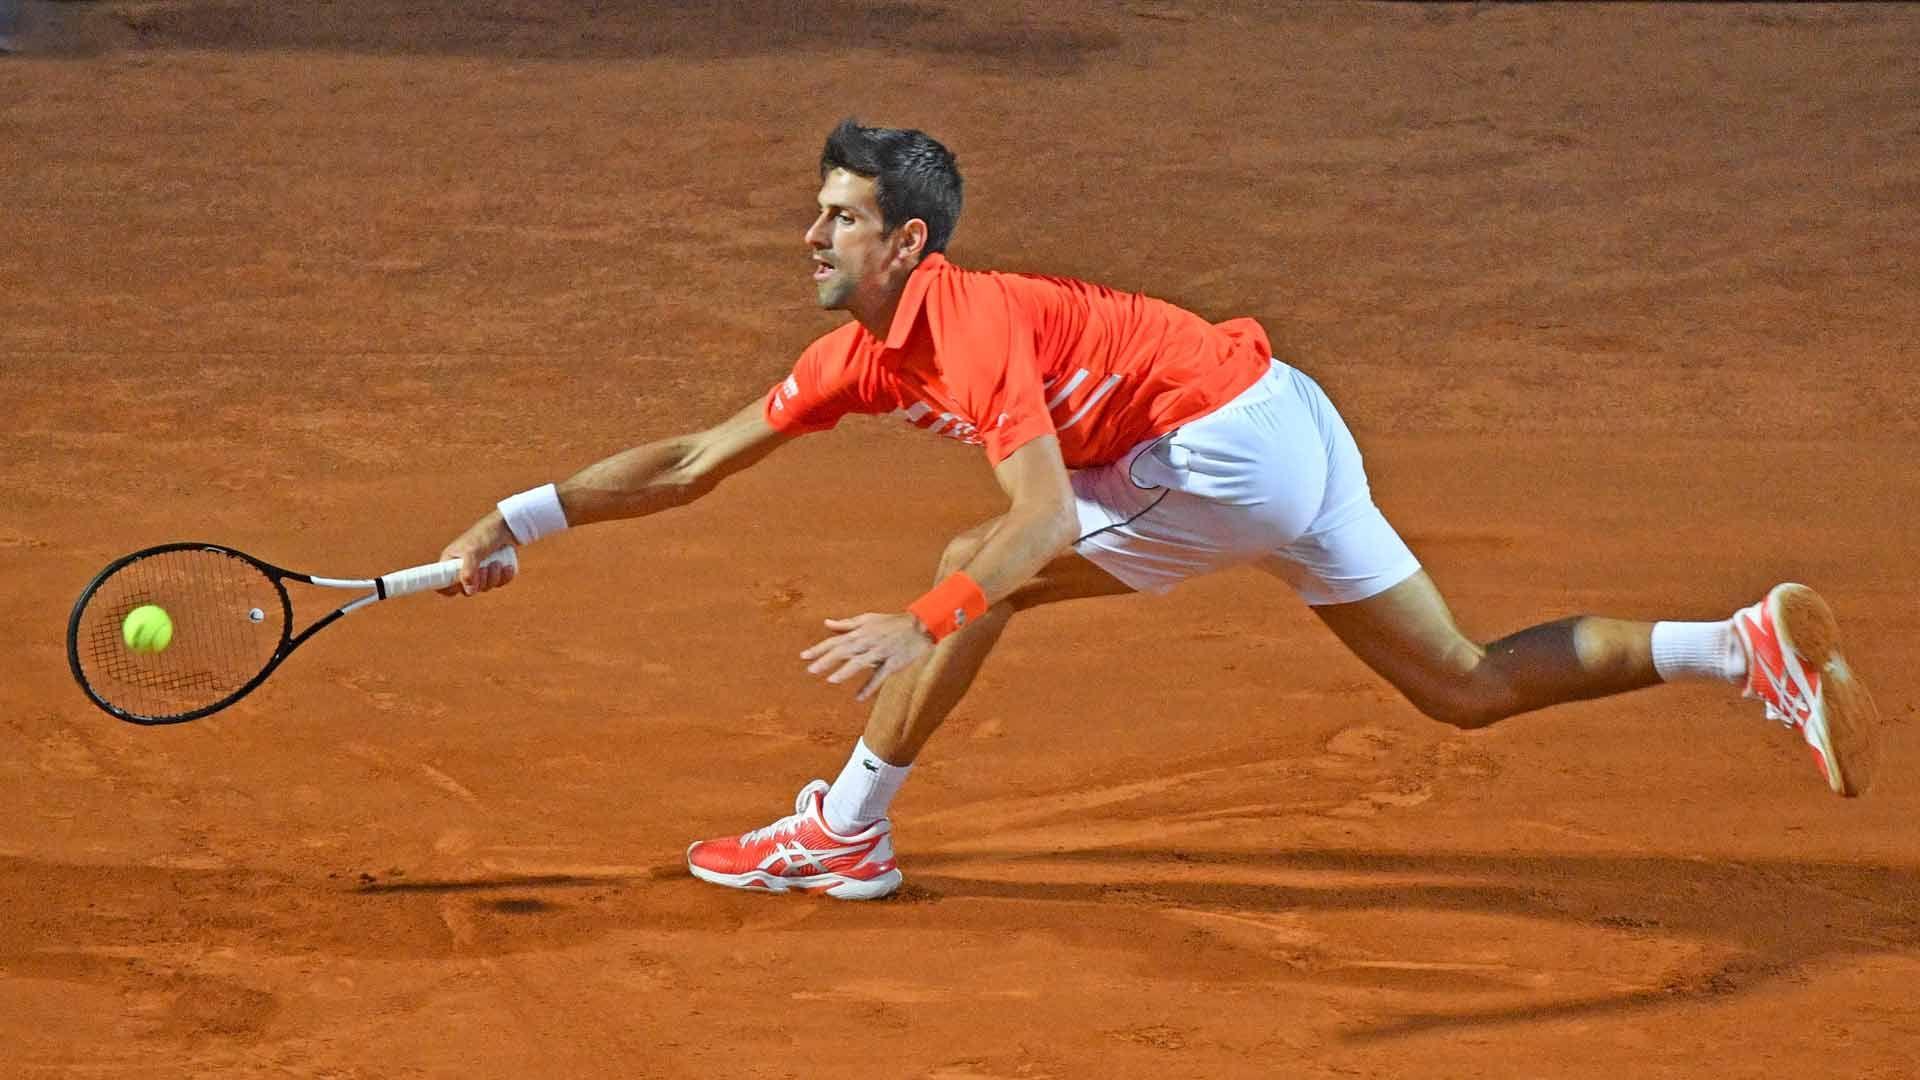 Novak Djokovic Beats Diego Schwartzman In Rome To Setup Final Against Rafael Nadal Atp Tour Con Imagenes